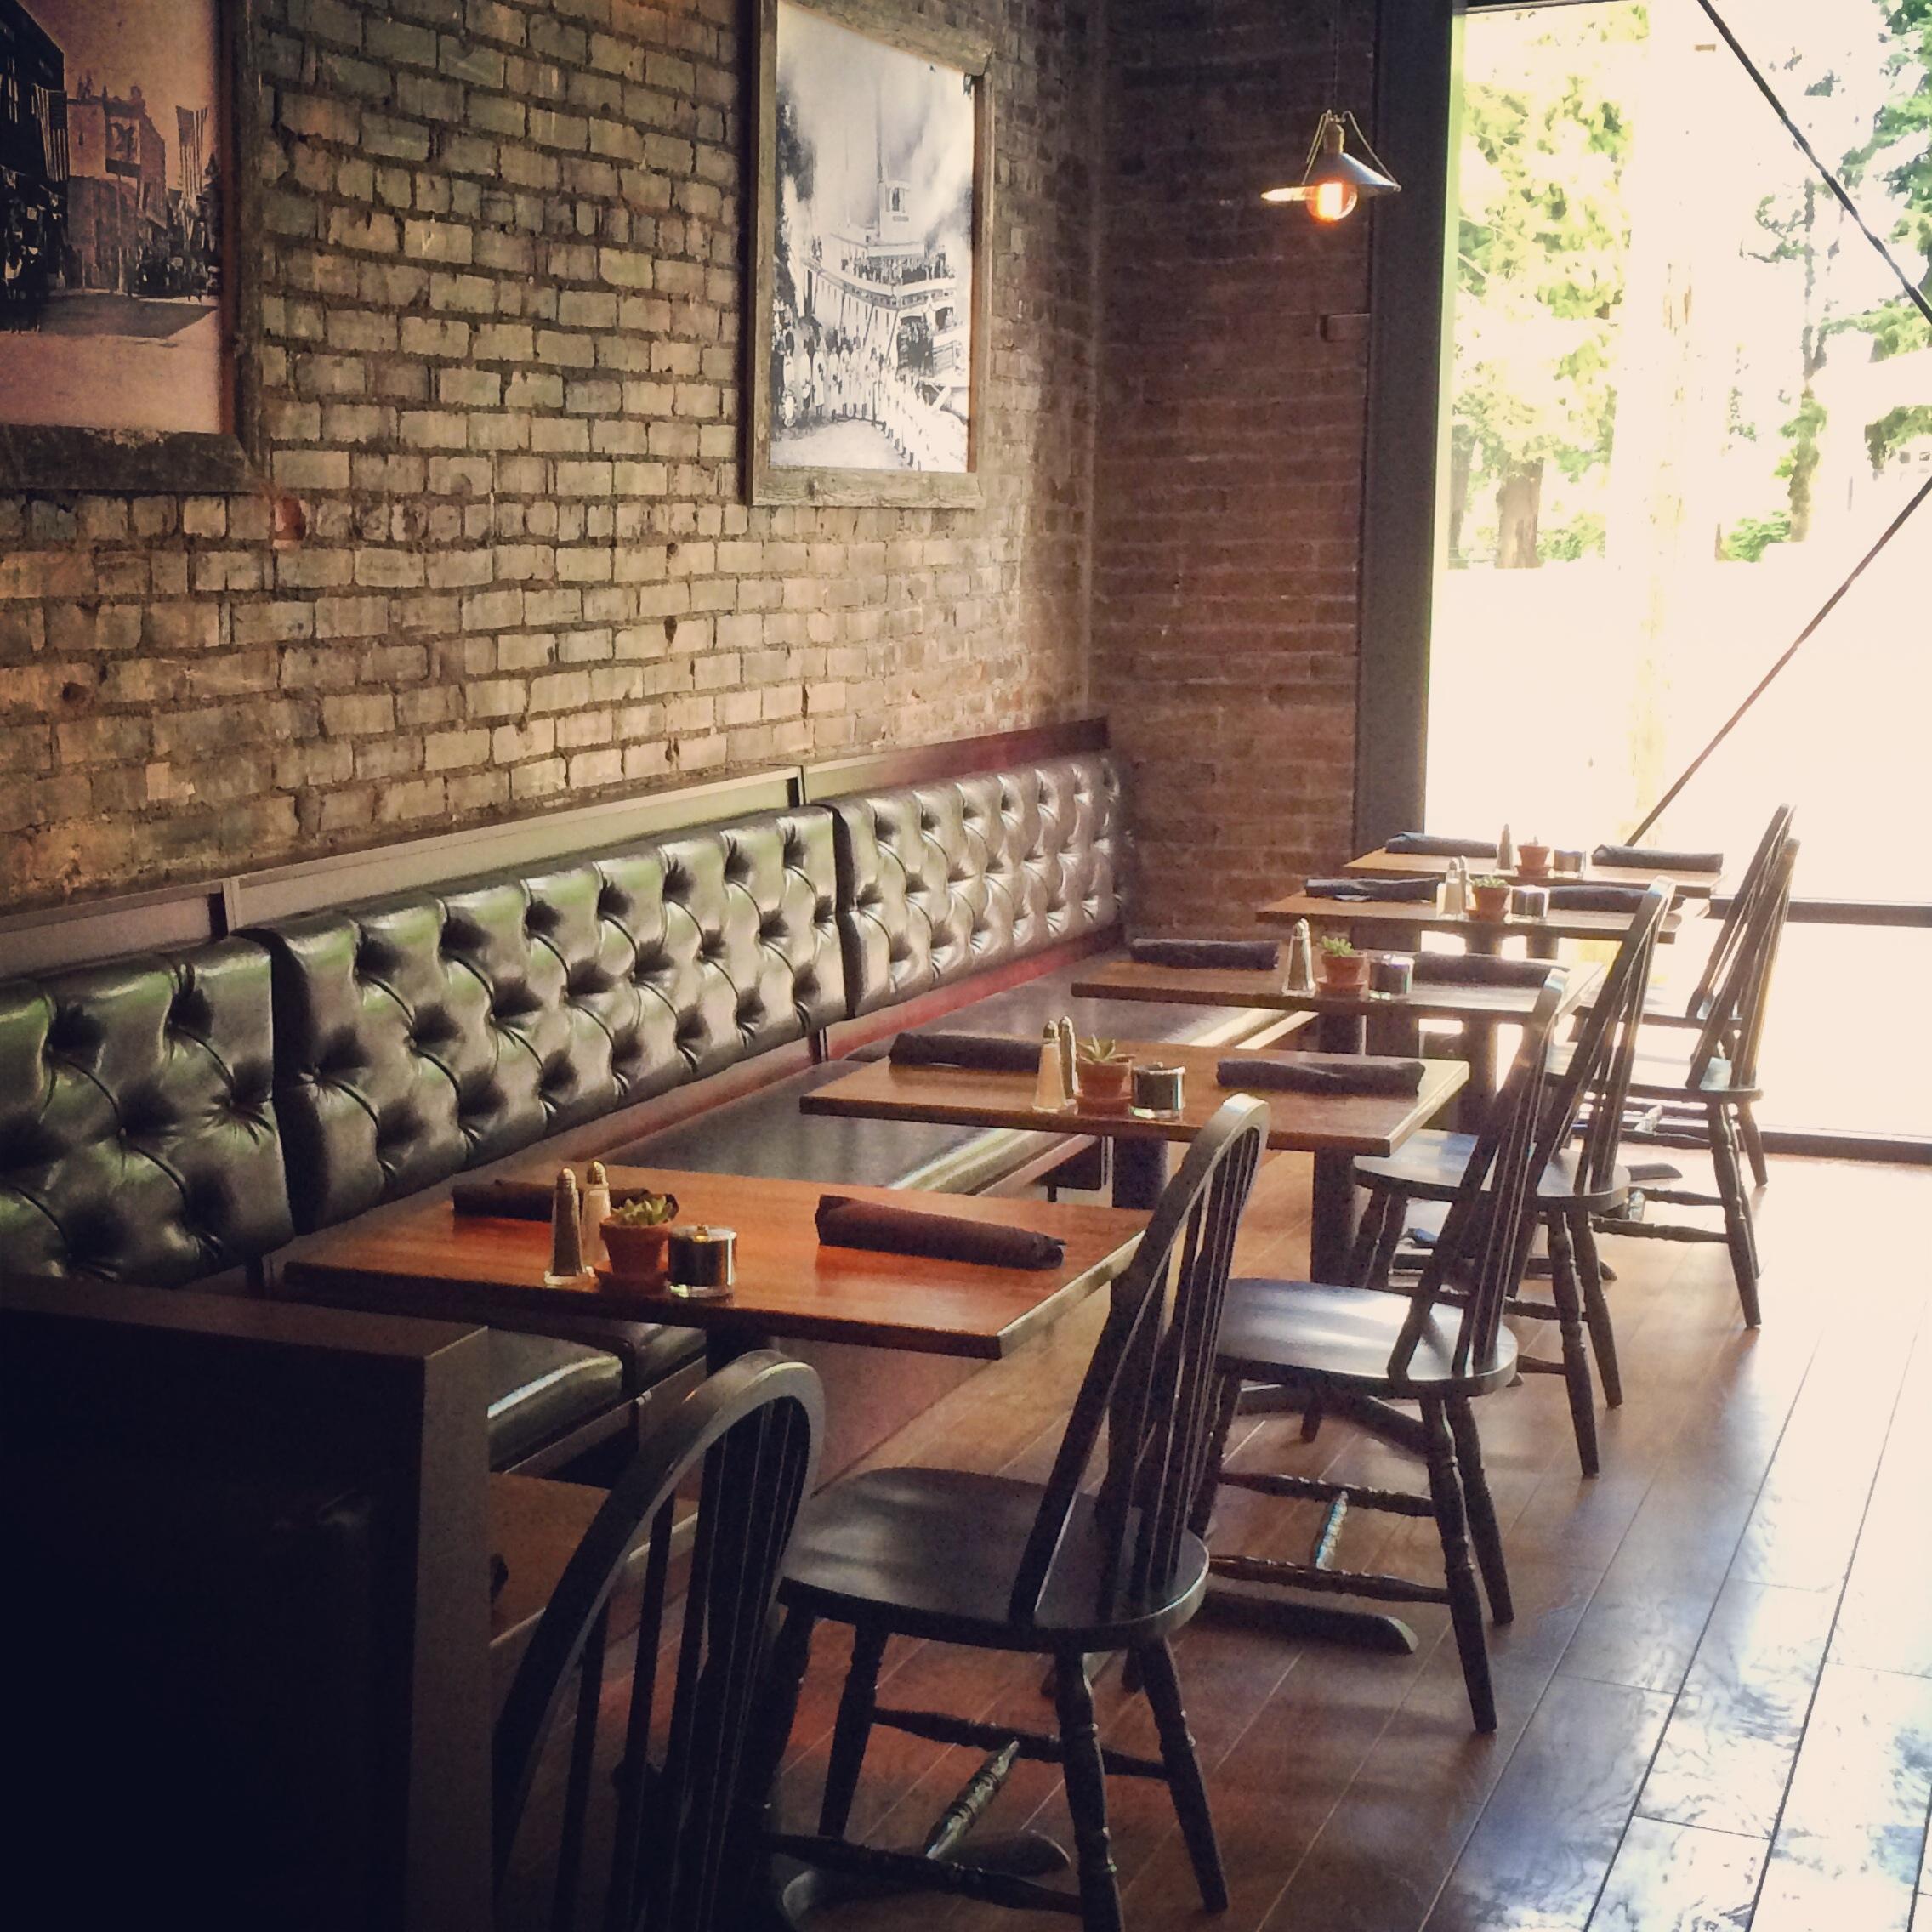 The Barlow Room Restaurant And Bar Serves Up Fresh Summer